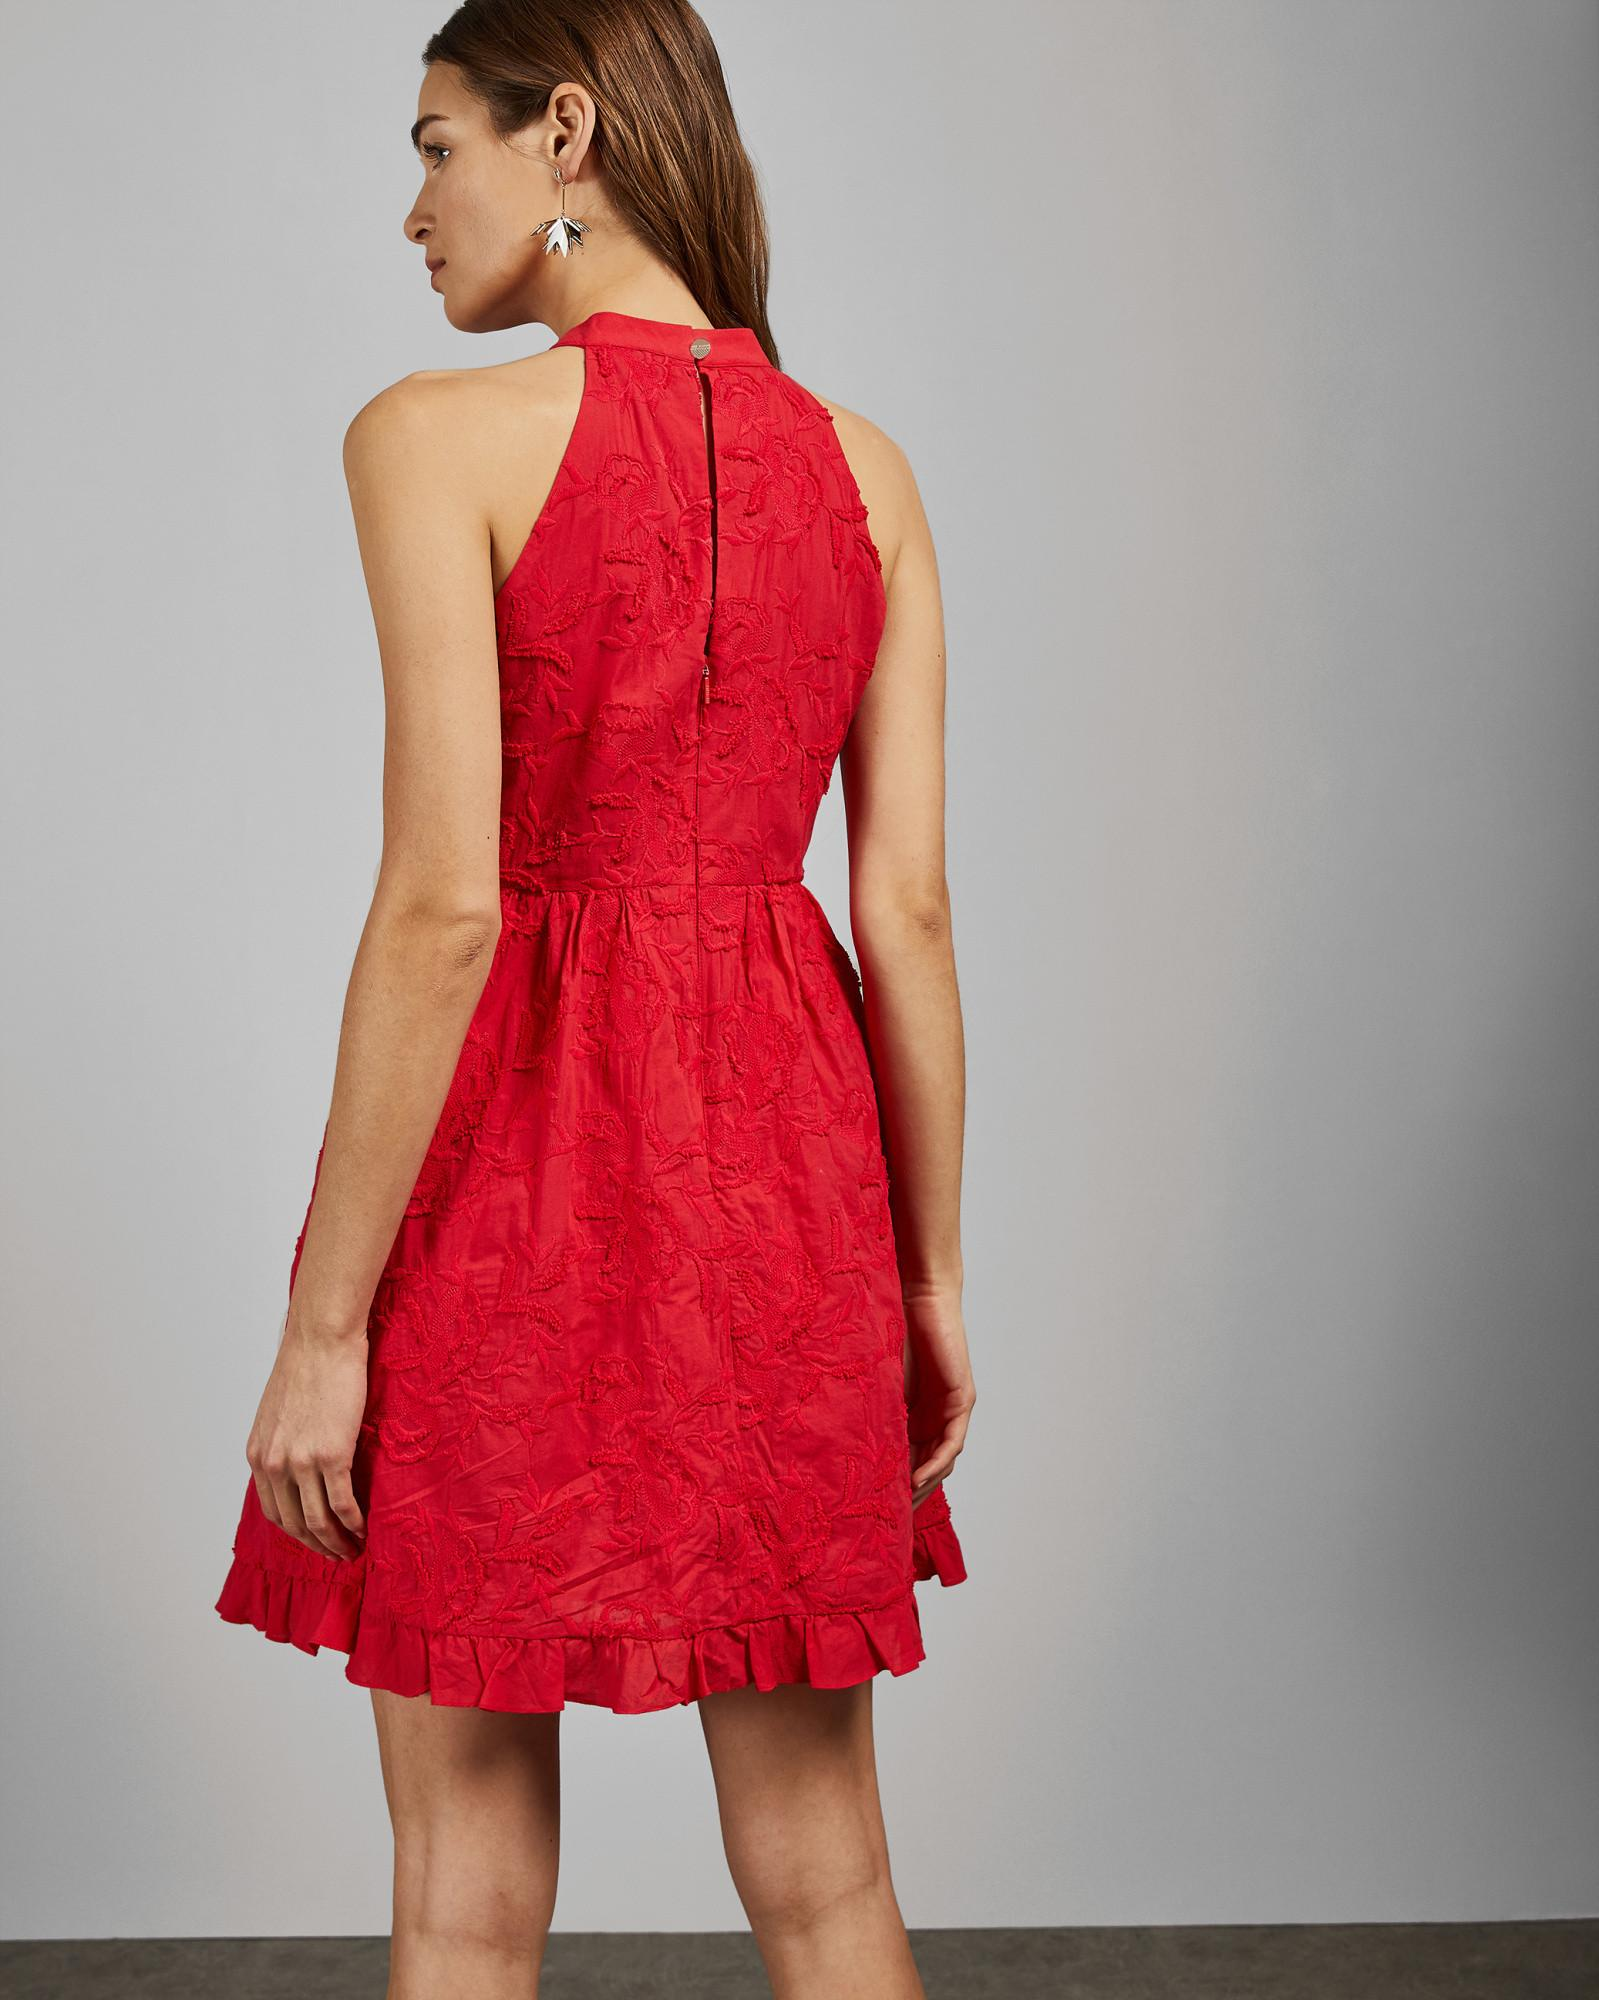 c5a8110a ... Halter Neck Skater Embroidery Dress - Lyst. View fullscreen